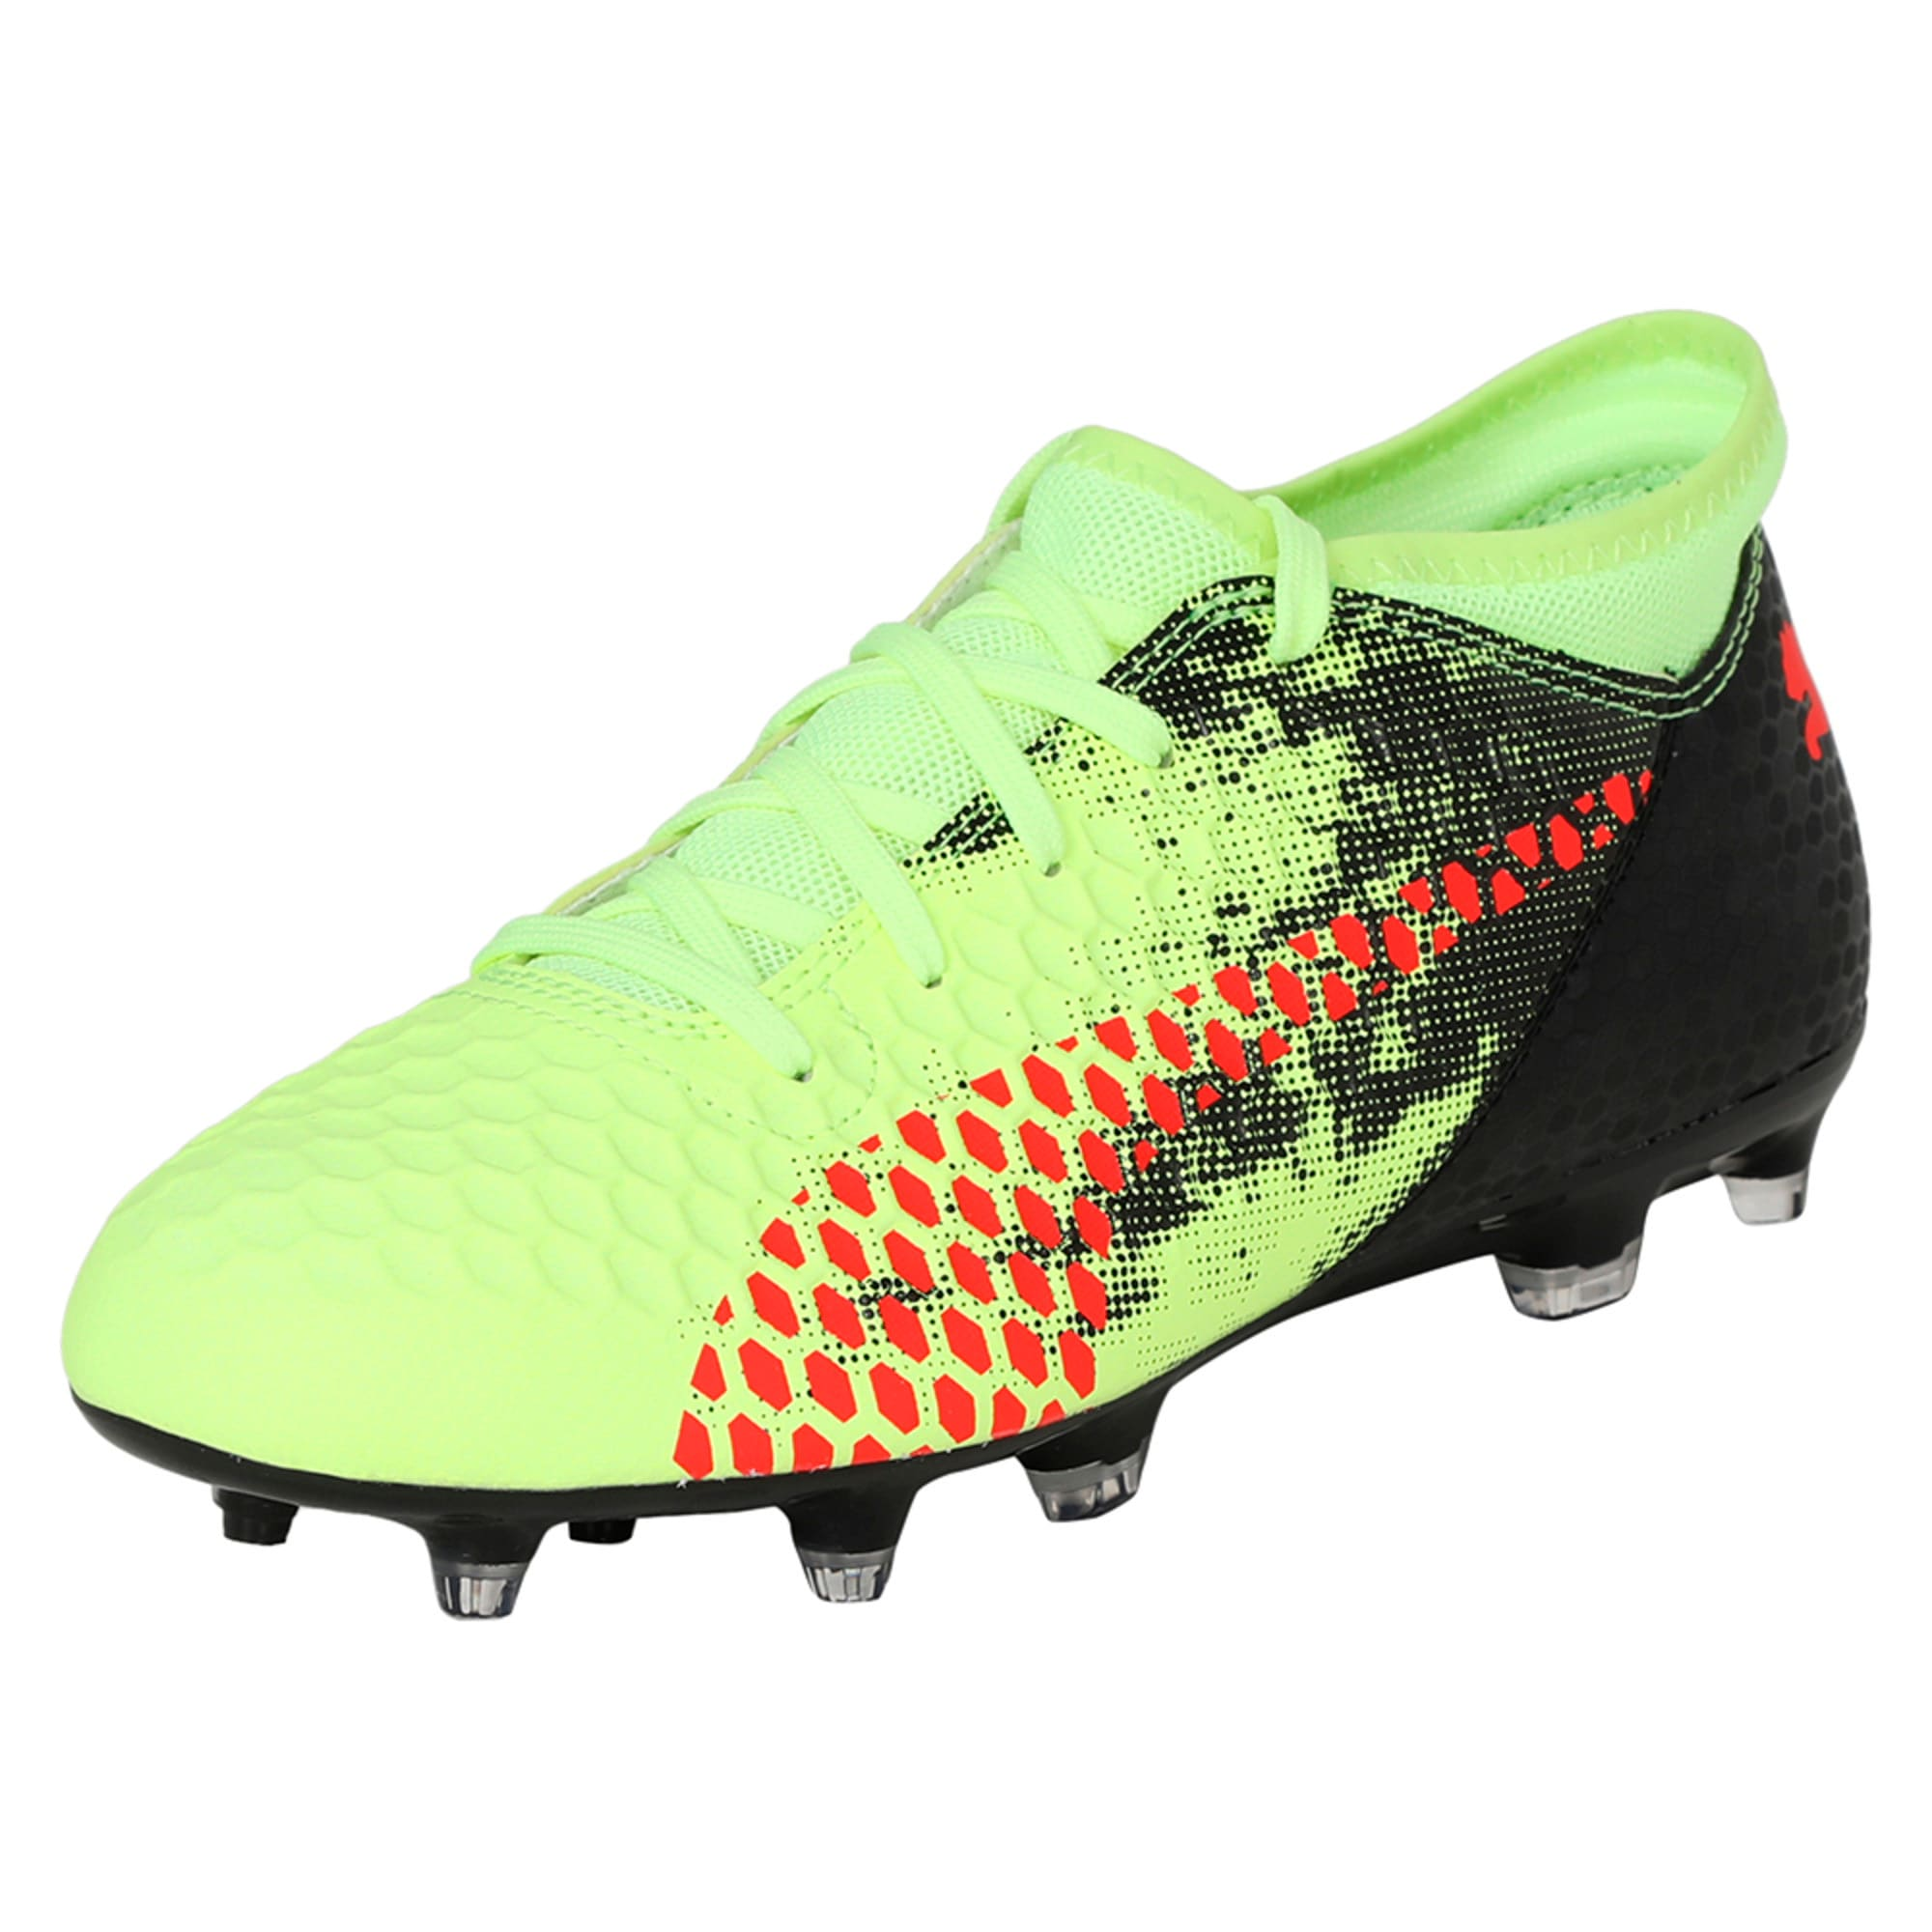 Thumbnail 1 of FUTURE 18.4 FG/AG Jr Football Boots, Yellow-Red-Black, medium-IND